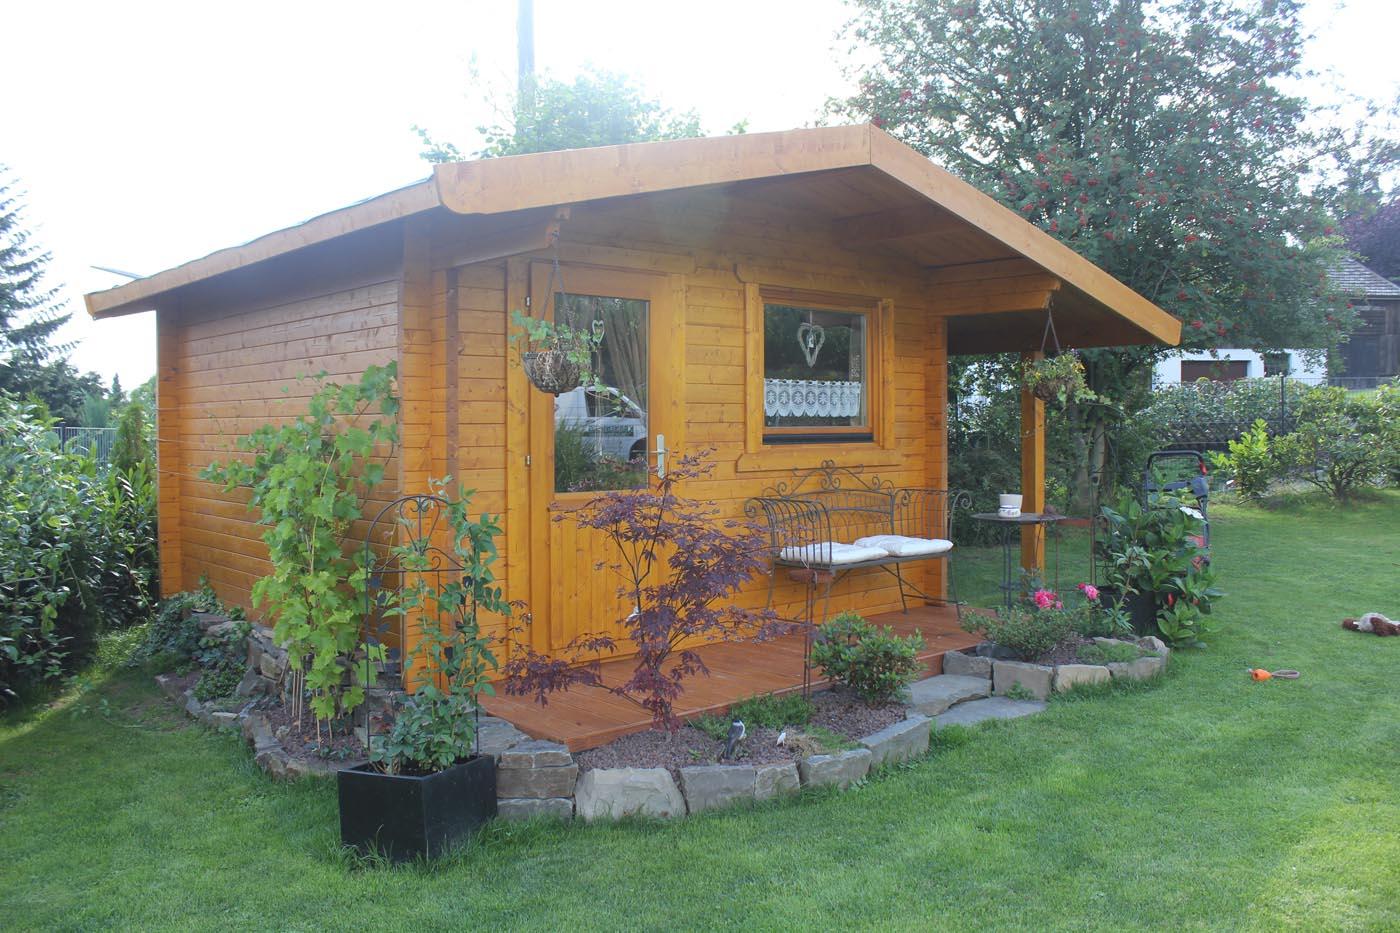 3 raum gartenhaus karibu woodfeeling gartenhaus schwandorf mm auenma b x t with 3 raum. Black Bedroom Furniture Sets. Home Design Ideas